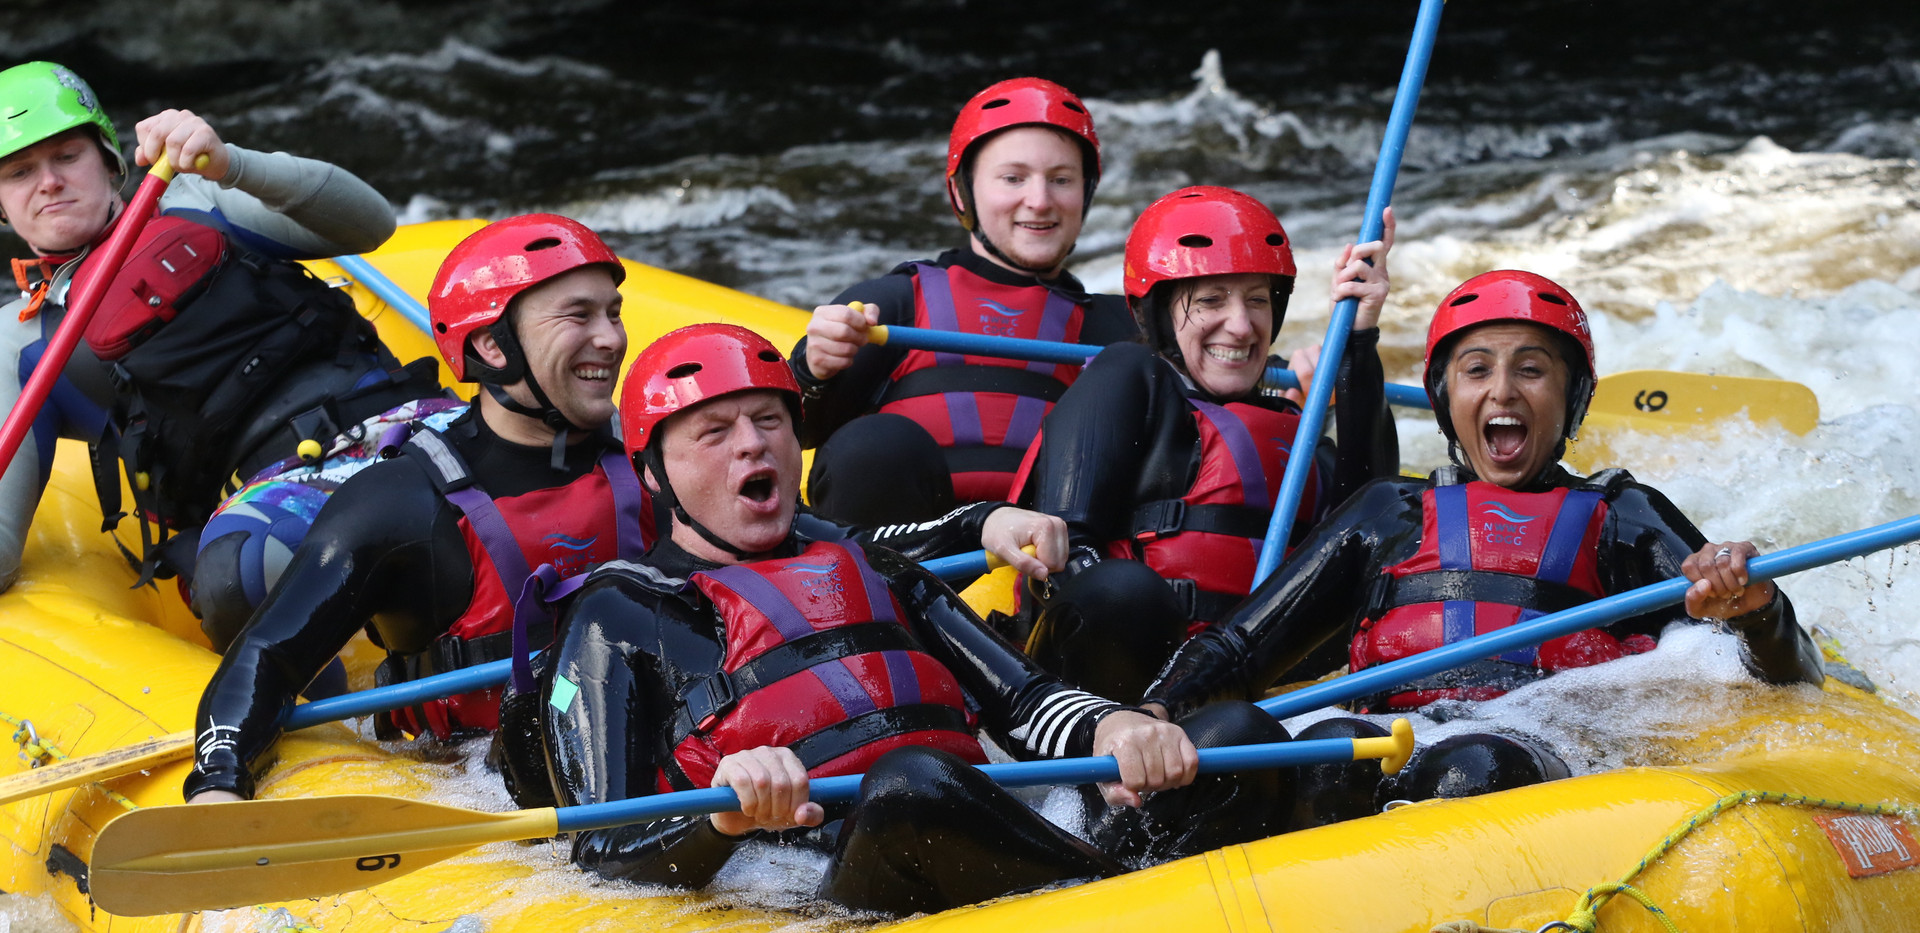 Clients having fun Whitewater Rafting in Wales, 2019 | Snowdonia | Fitness | Fun | Exercise | PT | Training | Friendly | Group | Sawbridgeworth | Harlow | Bishops Stortford | Essex | Hertfordshire